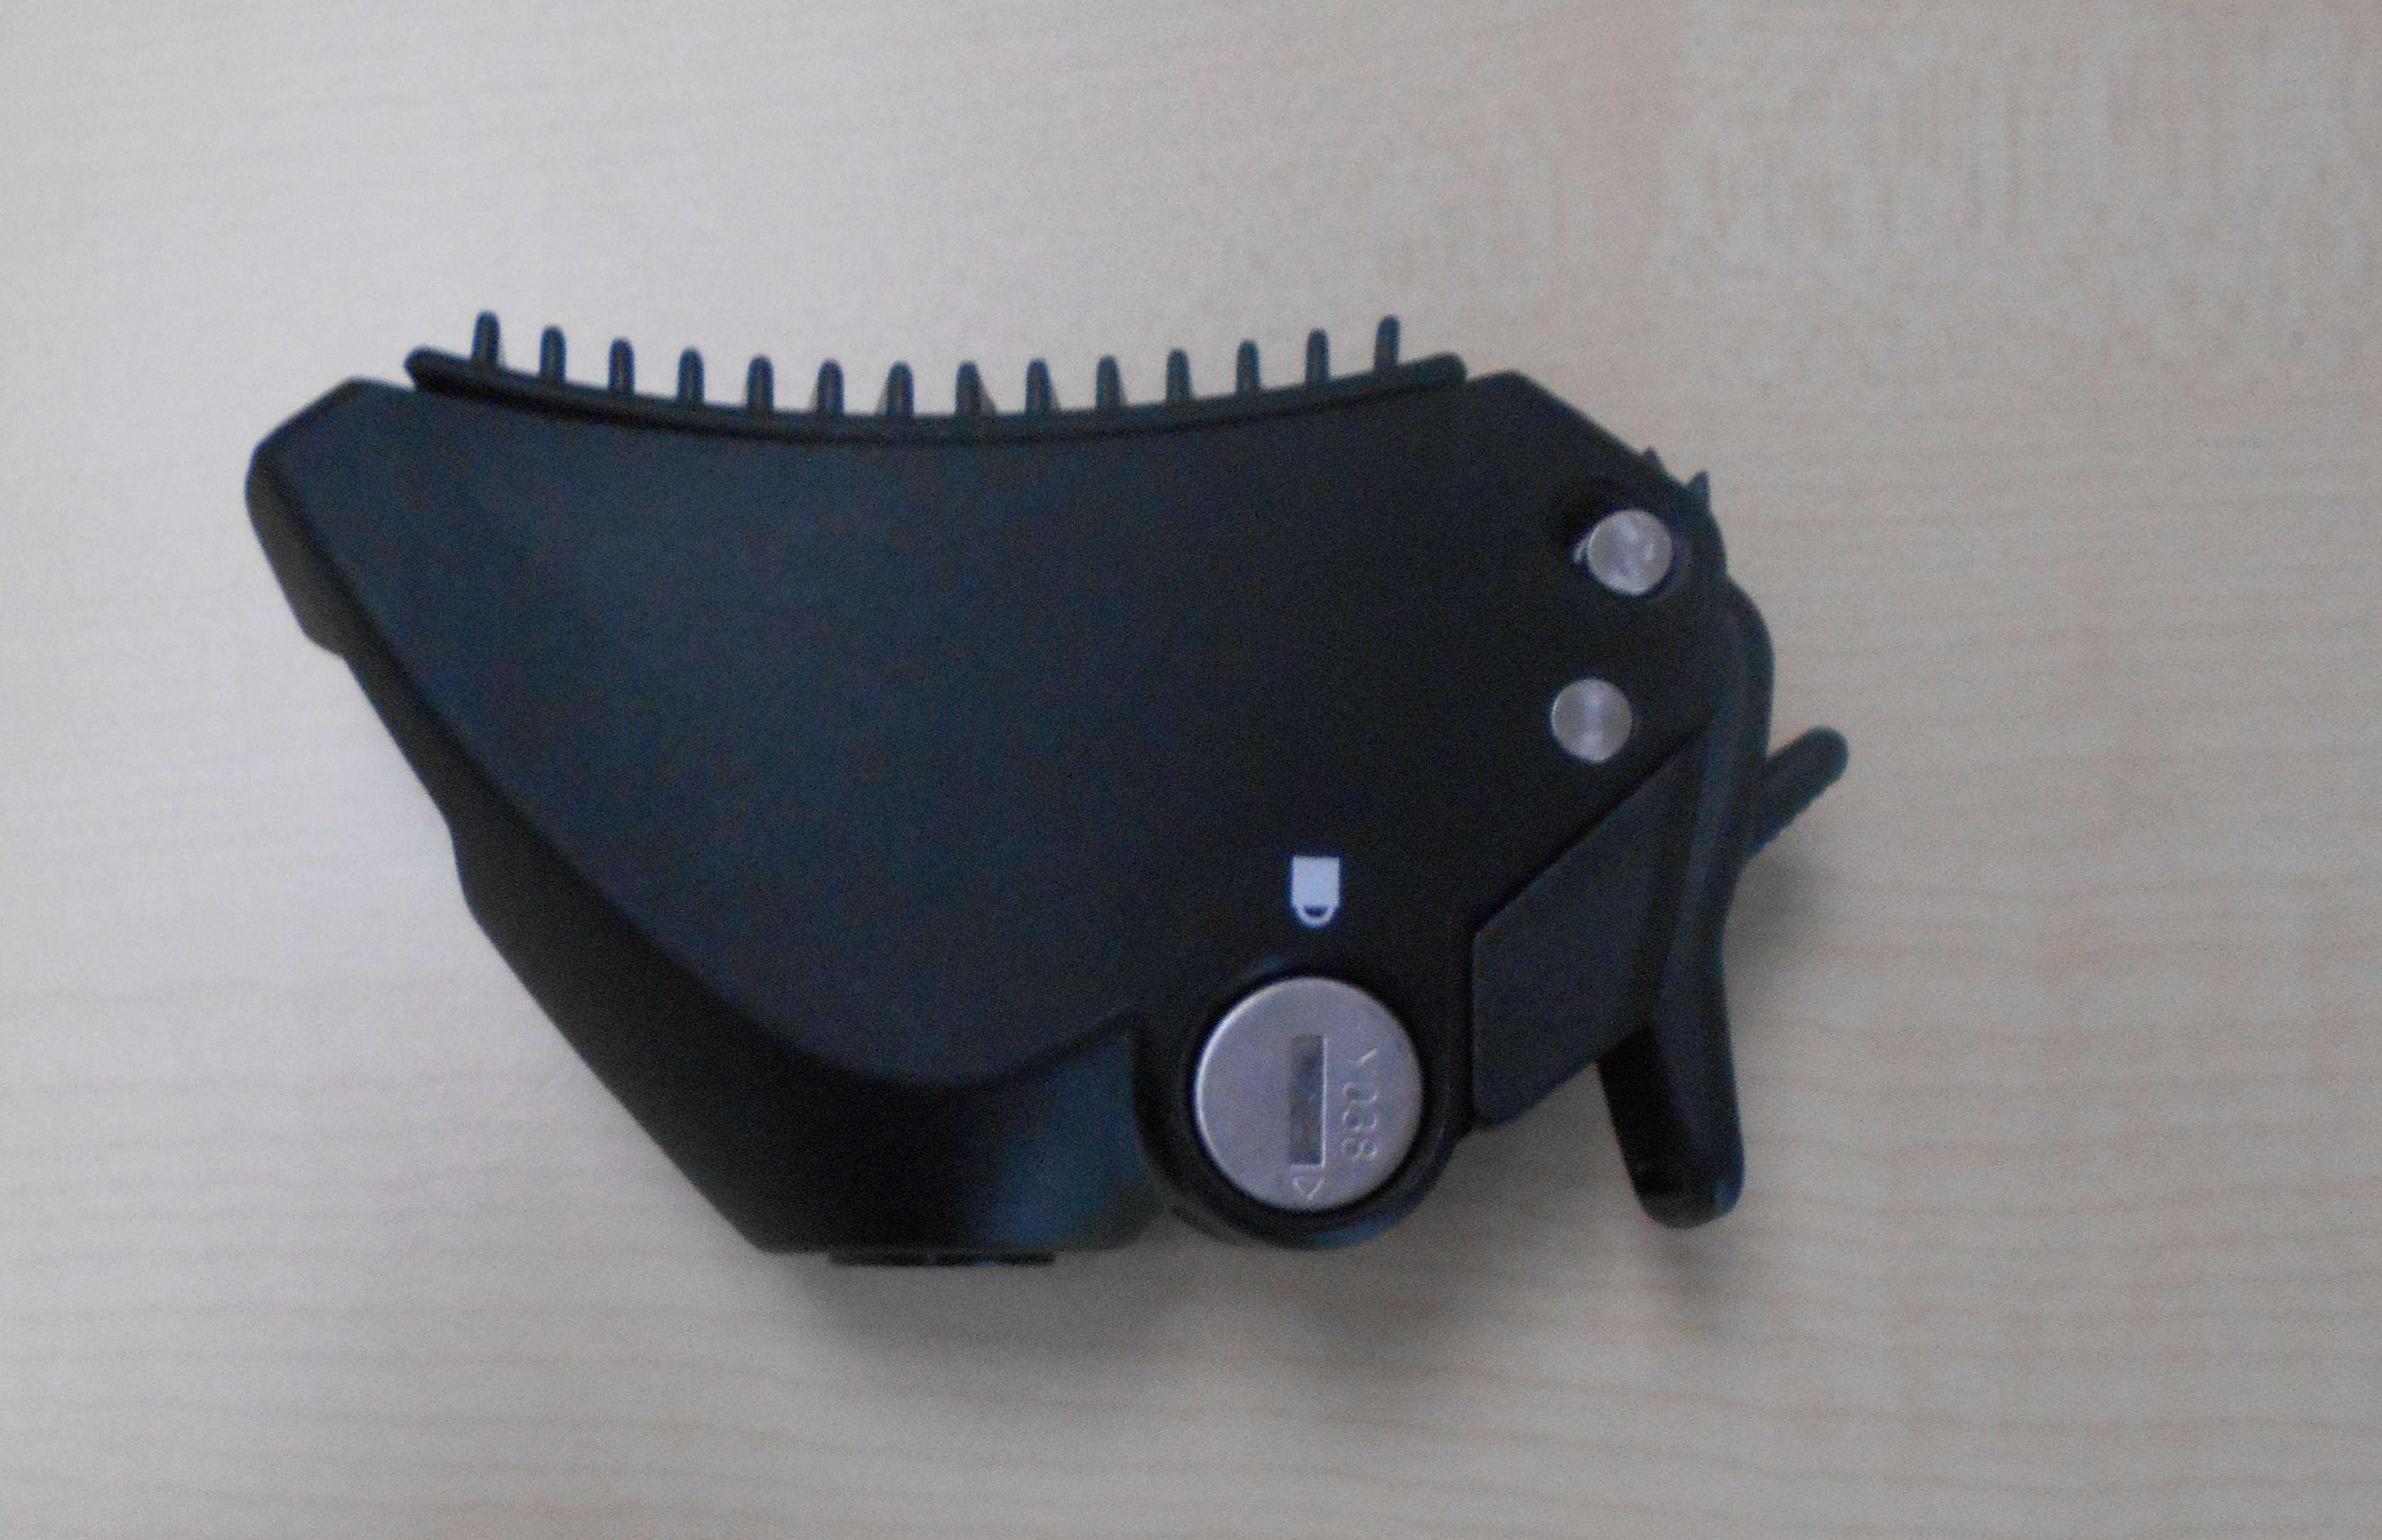 Kopf E-Bike Rahmenhalter mit Schlosscode Y013